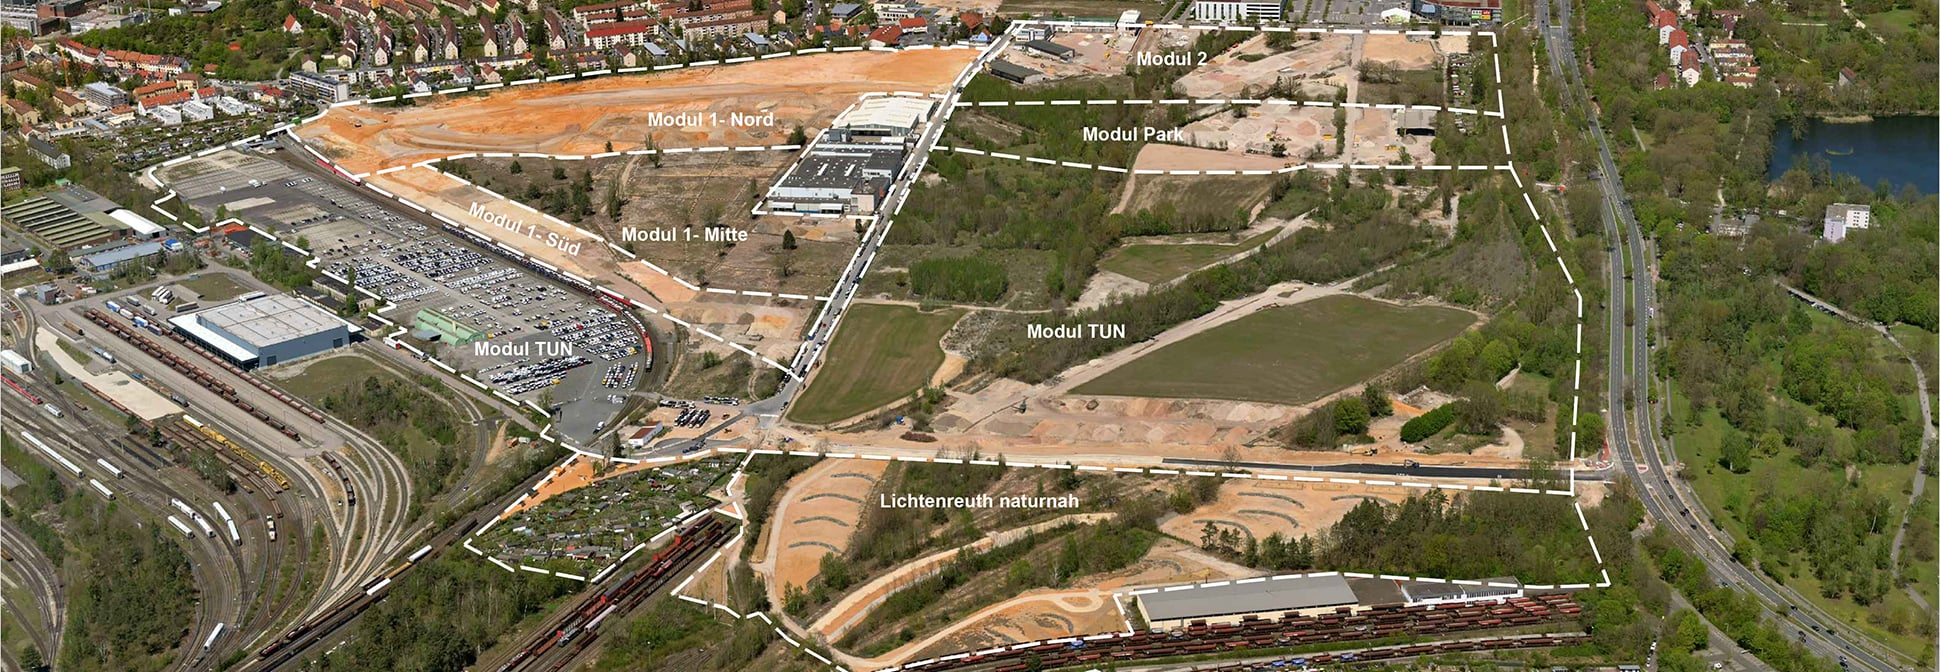 Grünordnungsplanung Nürnberg Lichtenreuth | © Nürnberg Luftbild | Hajo Dietz